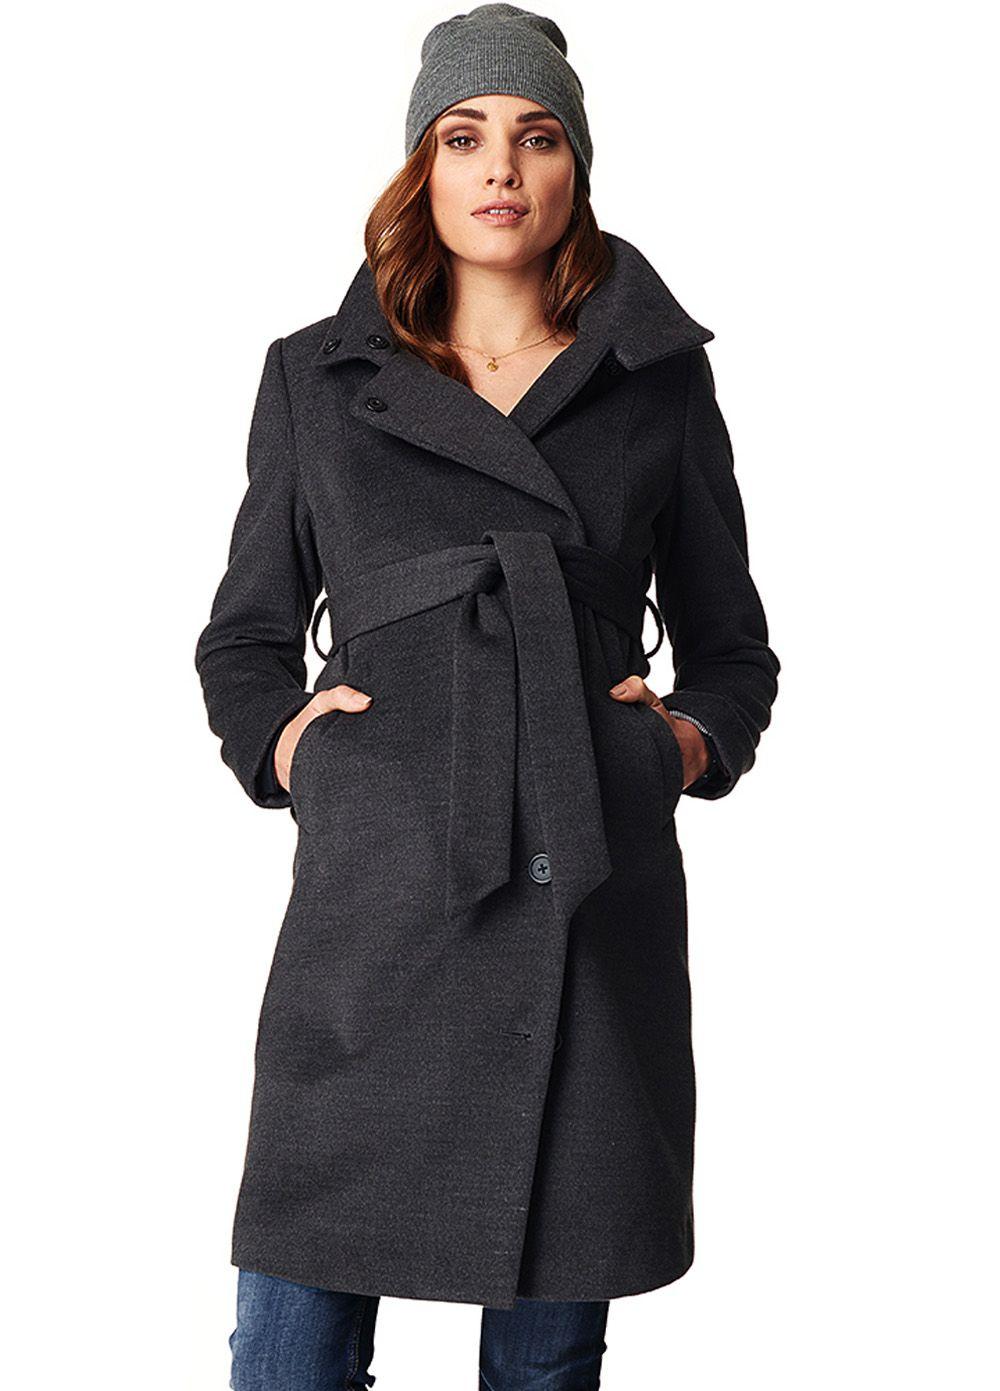 Noppies Black Melange Ilena Coat Maternity winter coat